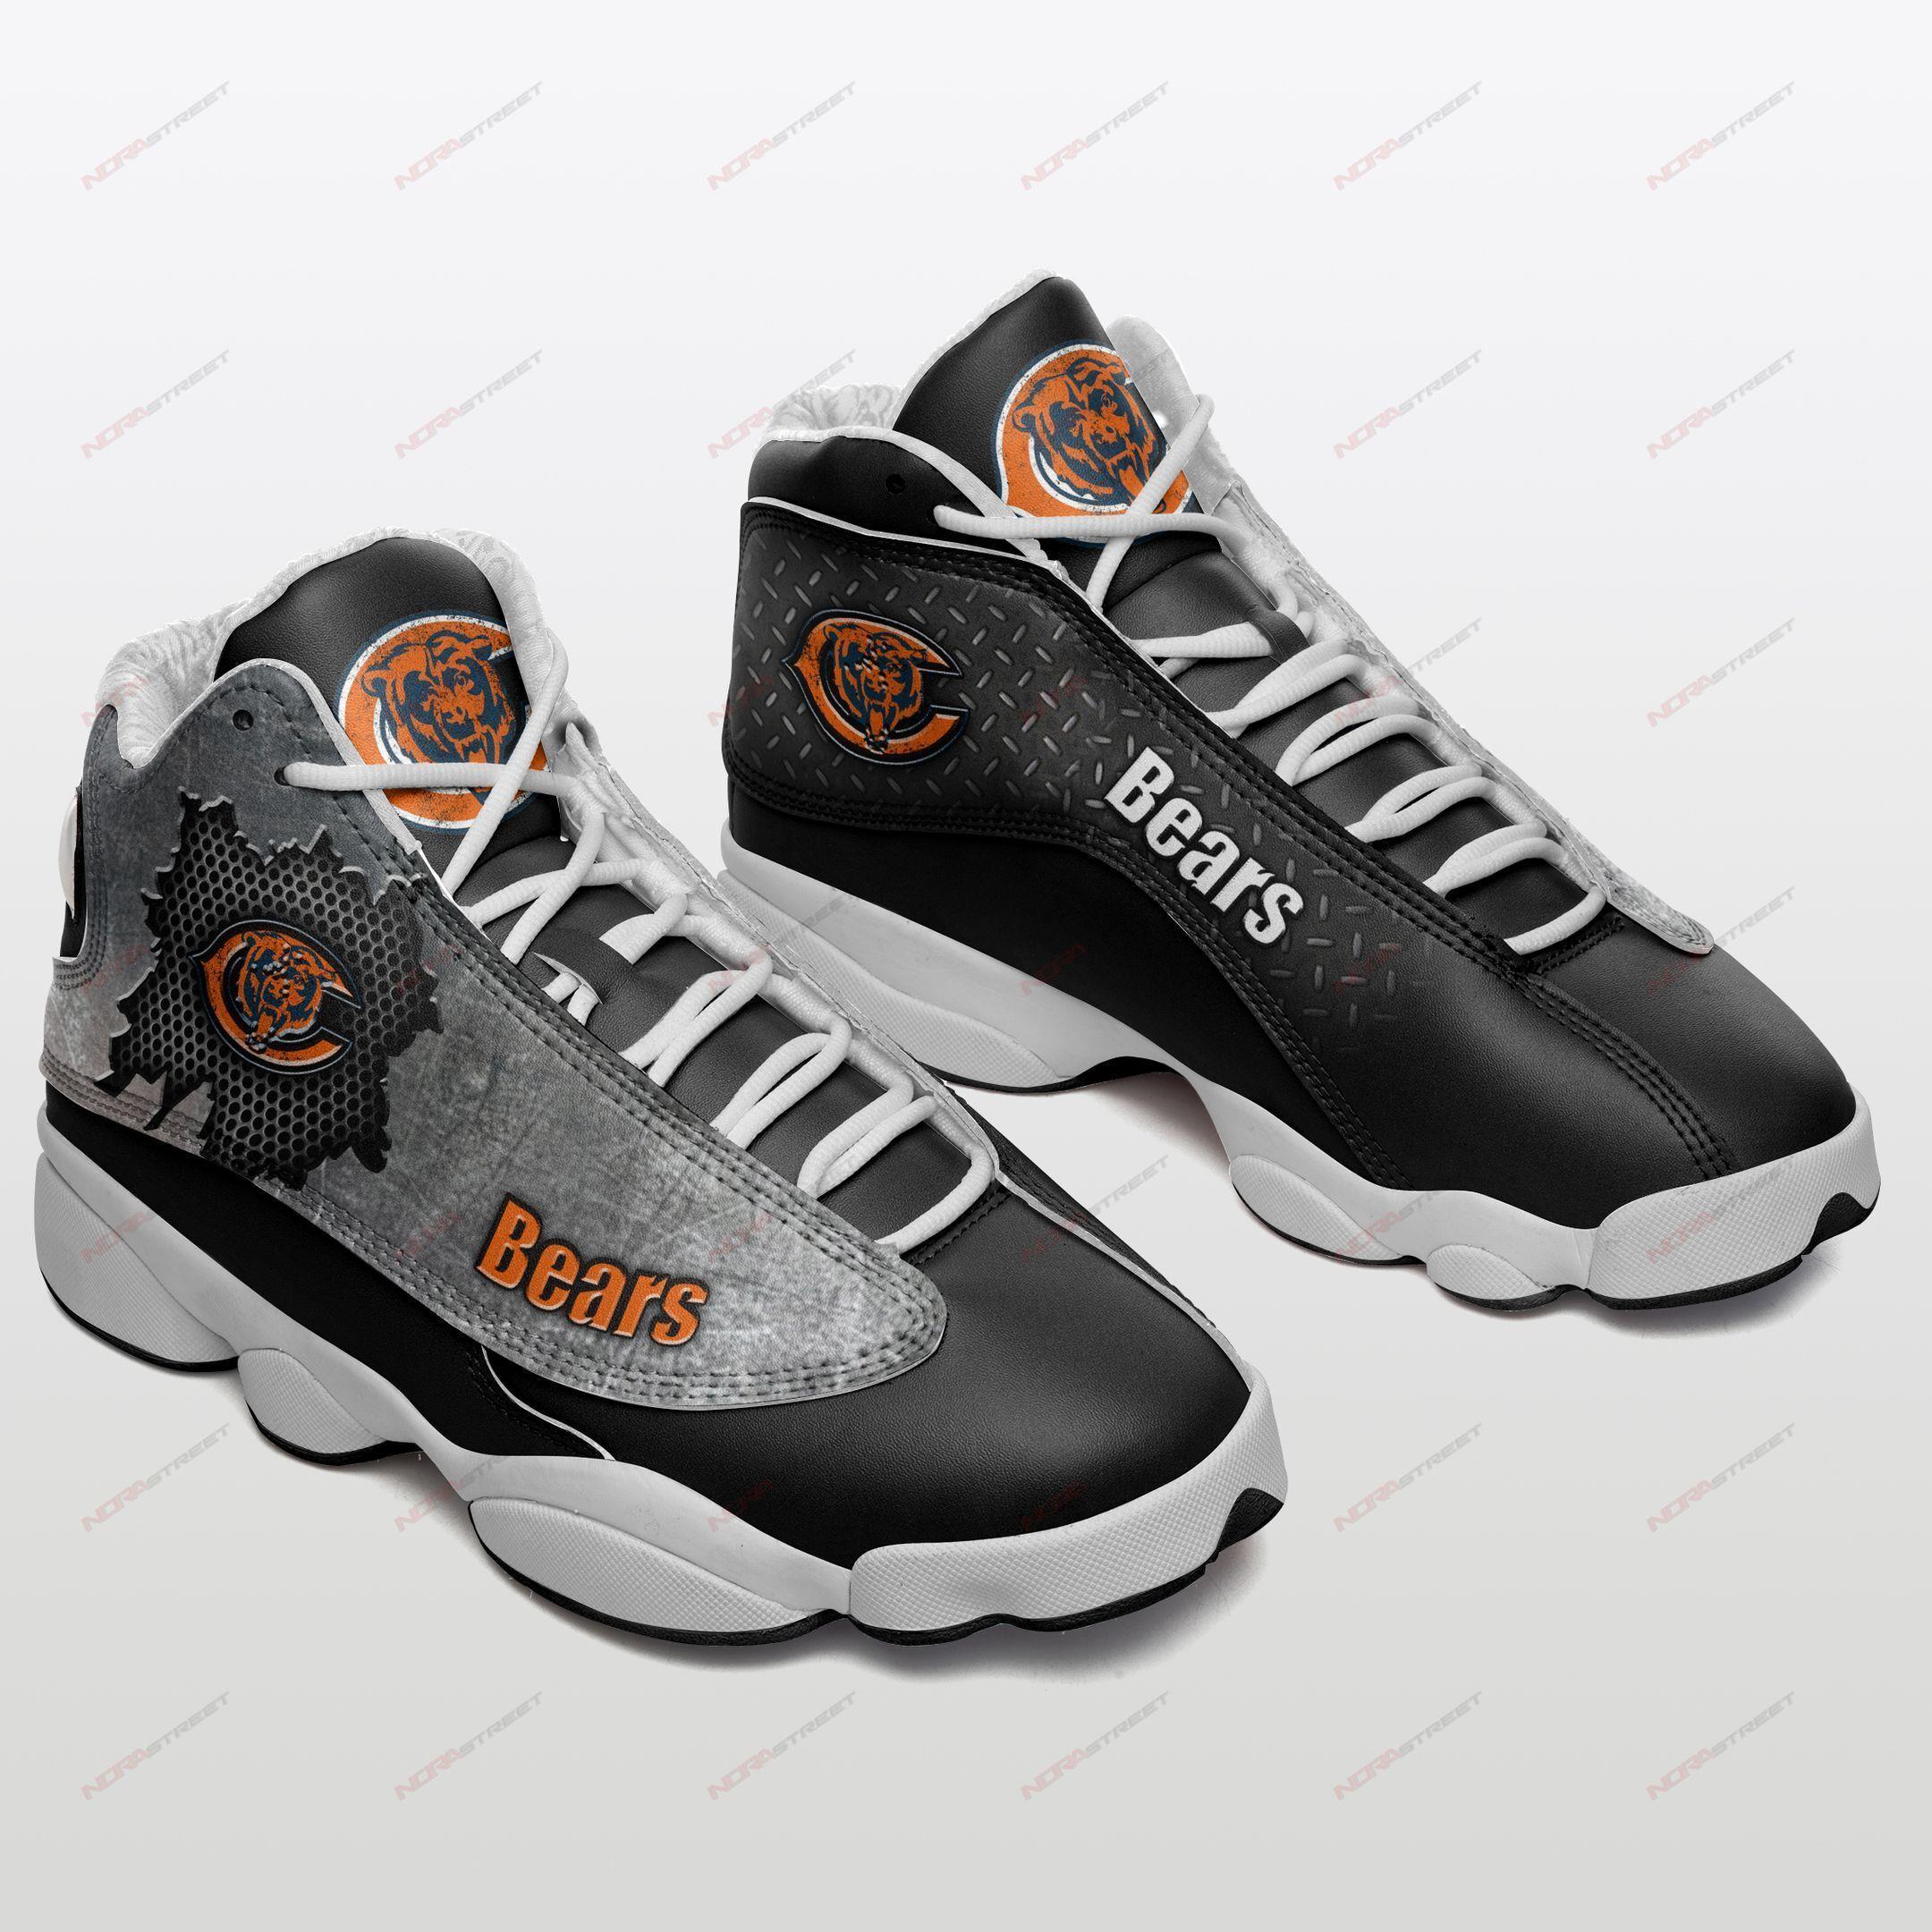 Chicago Bears Air Jordan 13 Sneakers Sport Shoes Plus Size